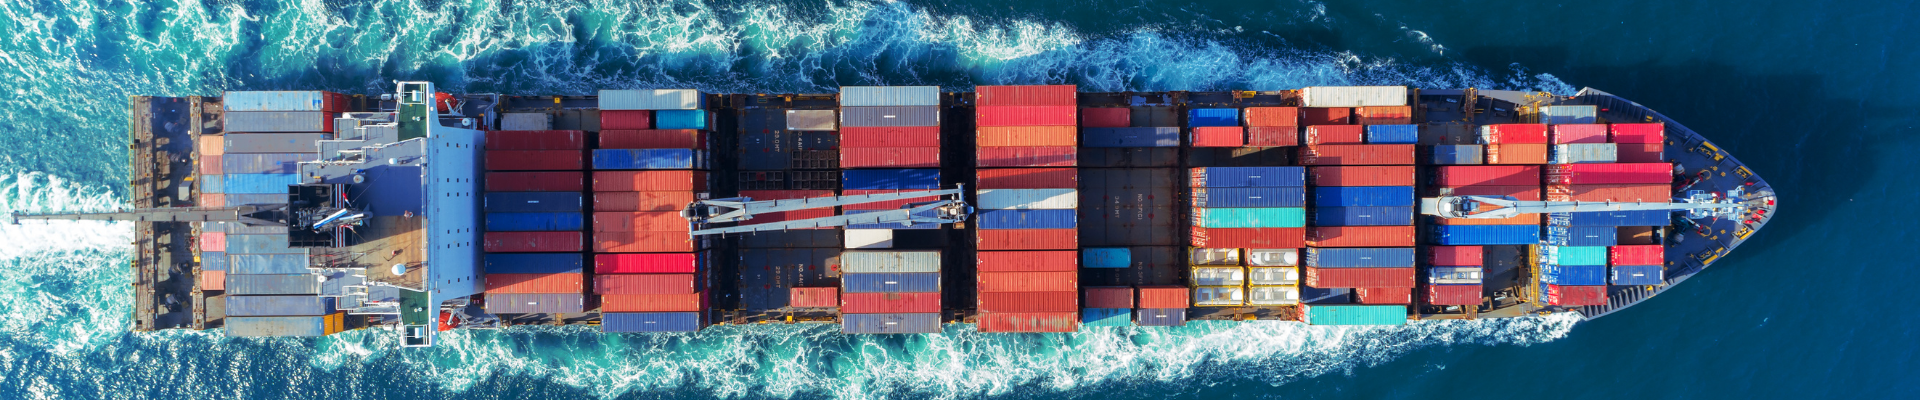 Picture of cargo ship. uk aus trade deal, aus uk trade deal, uk australia, australia uk trade deal, uk free trade deals, australia uk free trade agreement